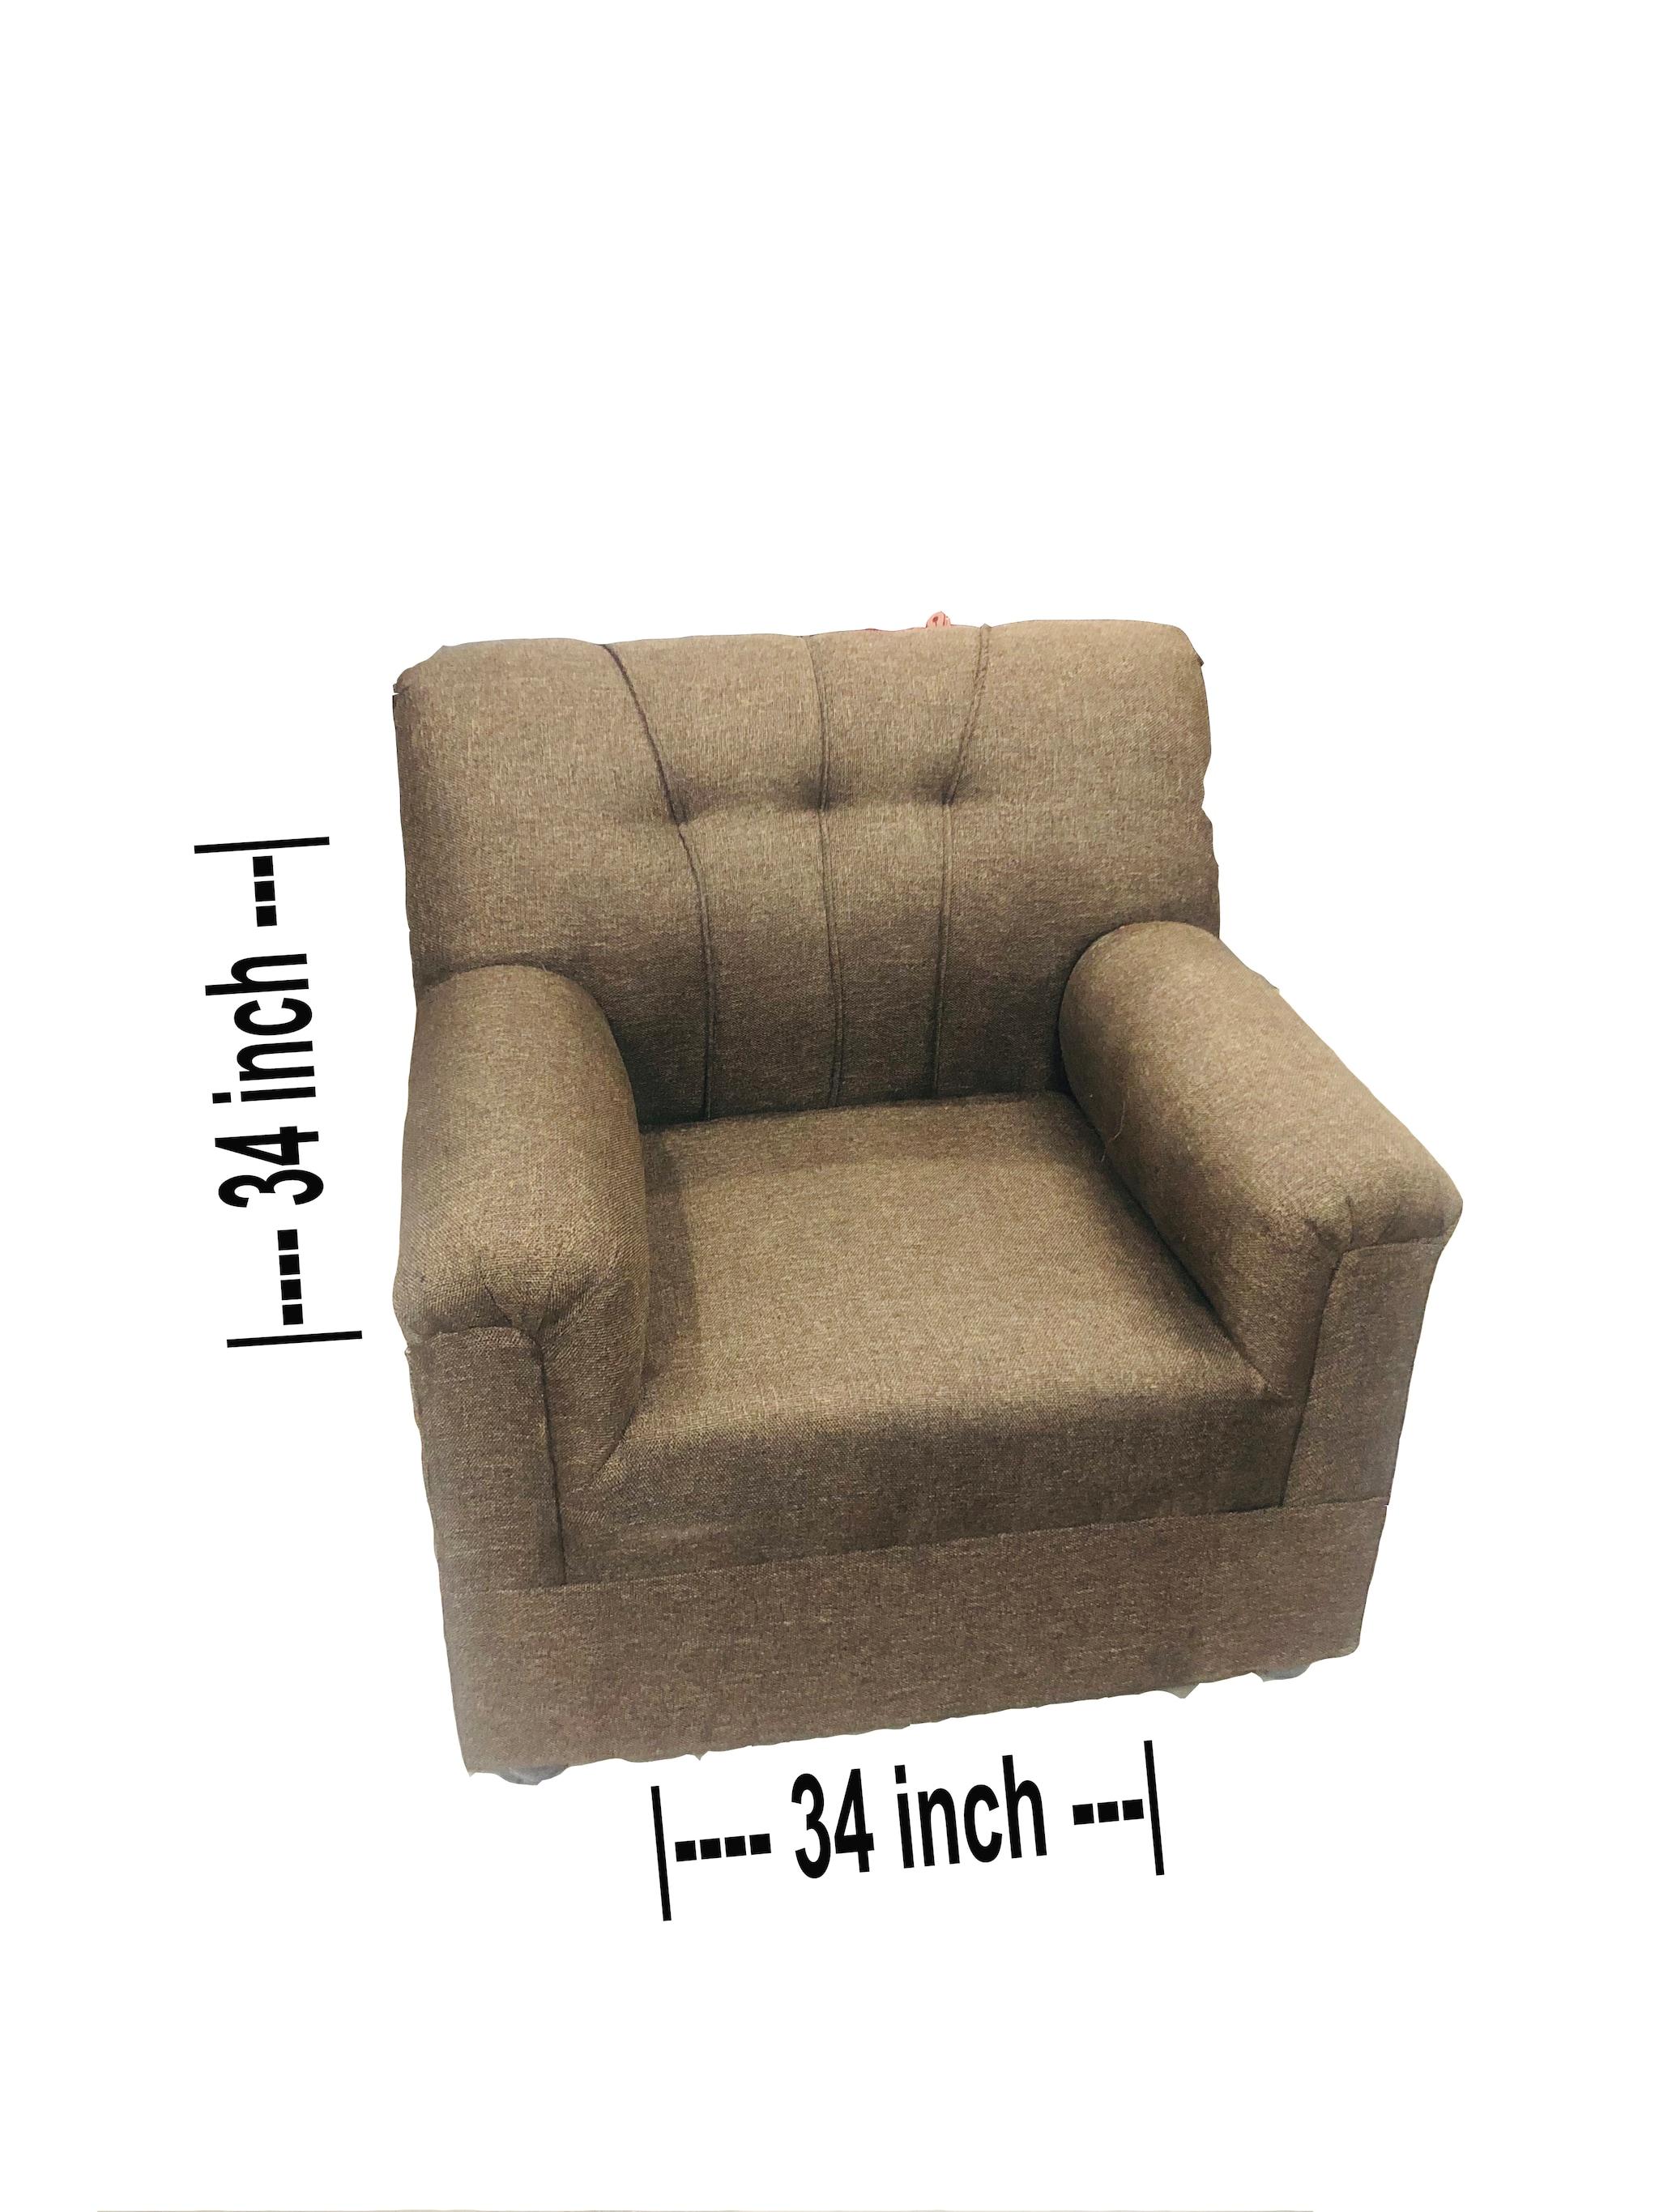 Basic Sofa 3+1+1 (Brown)